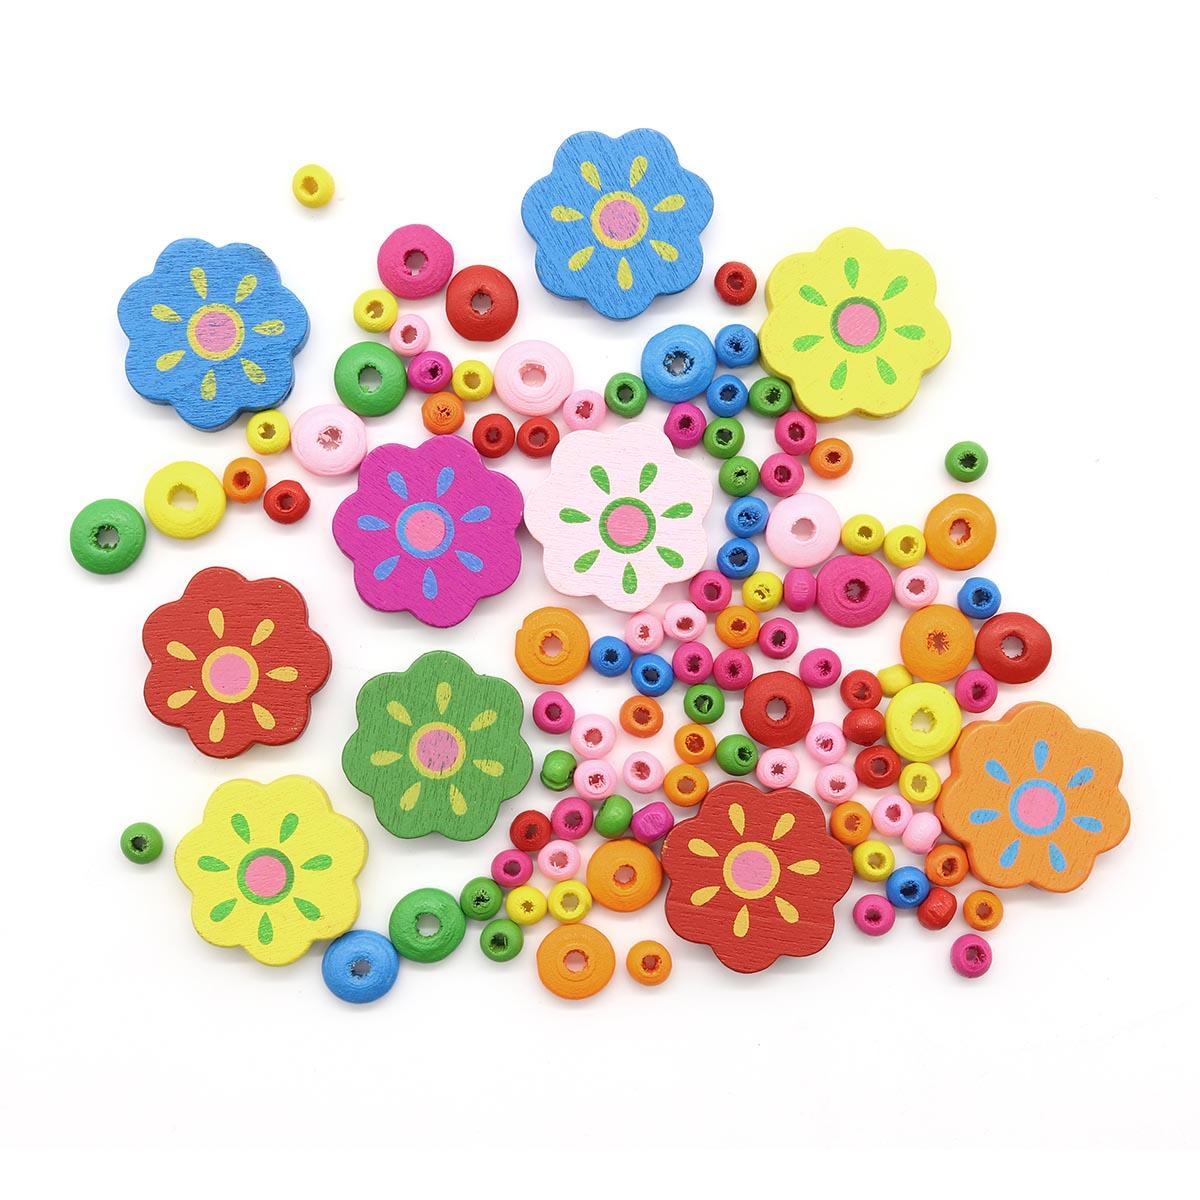 61618004 Набор деревянных бусин 'Цветок', 25 мм, Glorex